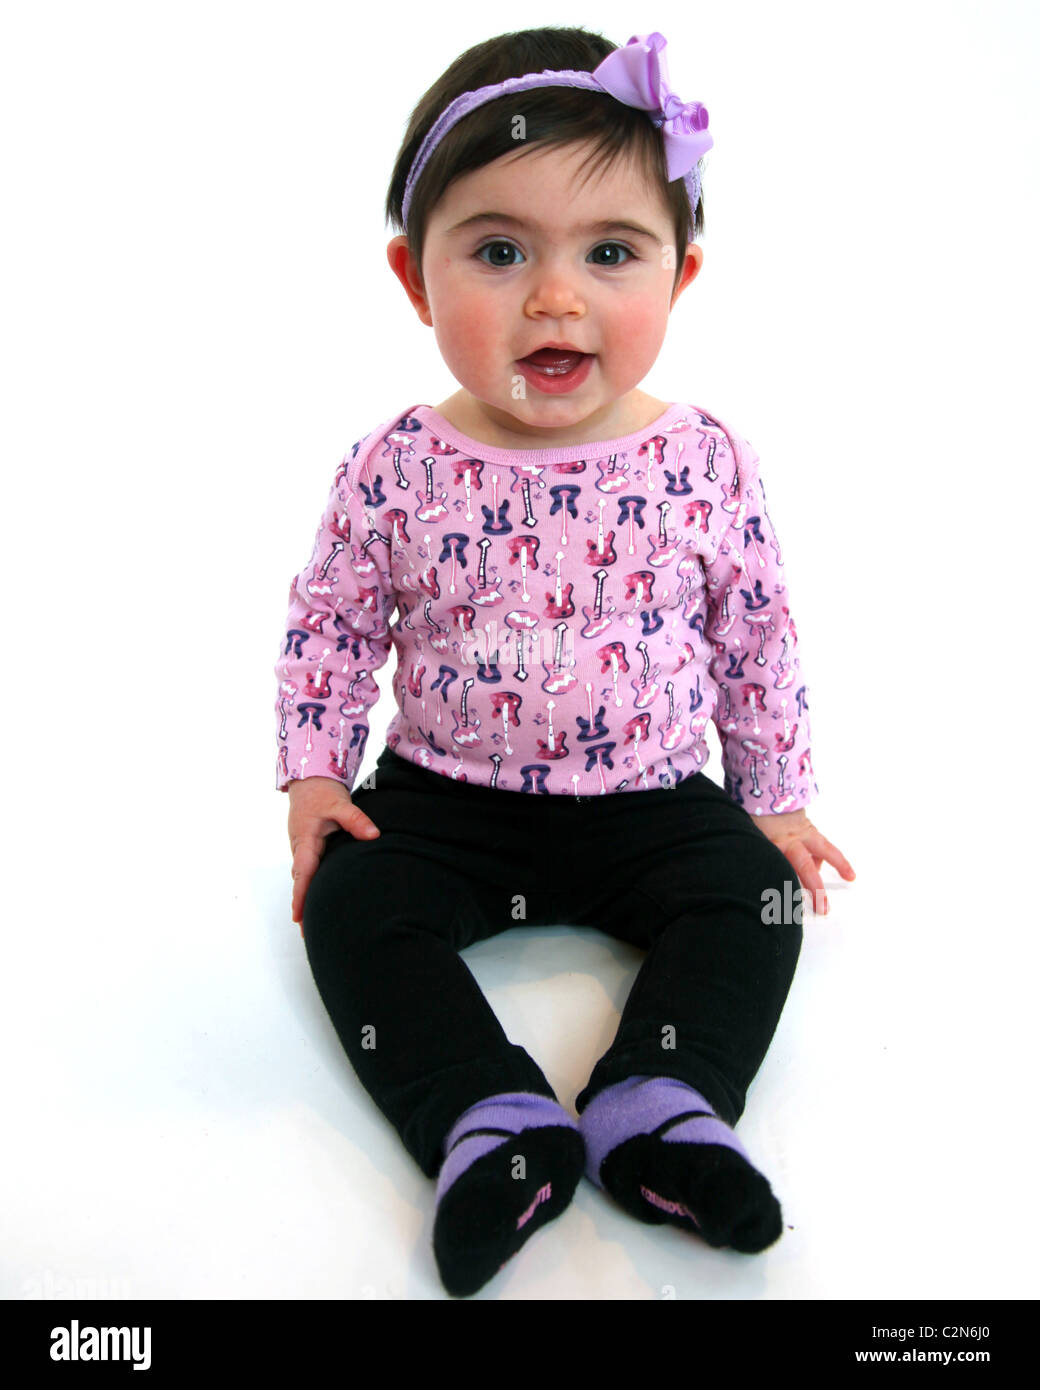 Happy baby sitting up in studio. - Stock Image